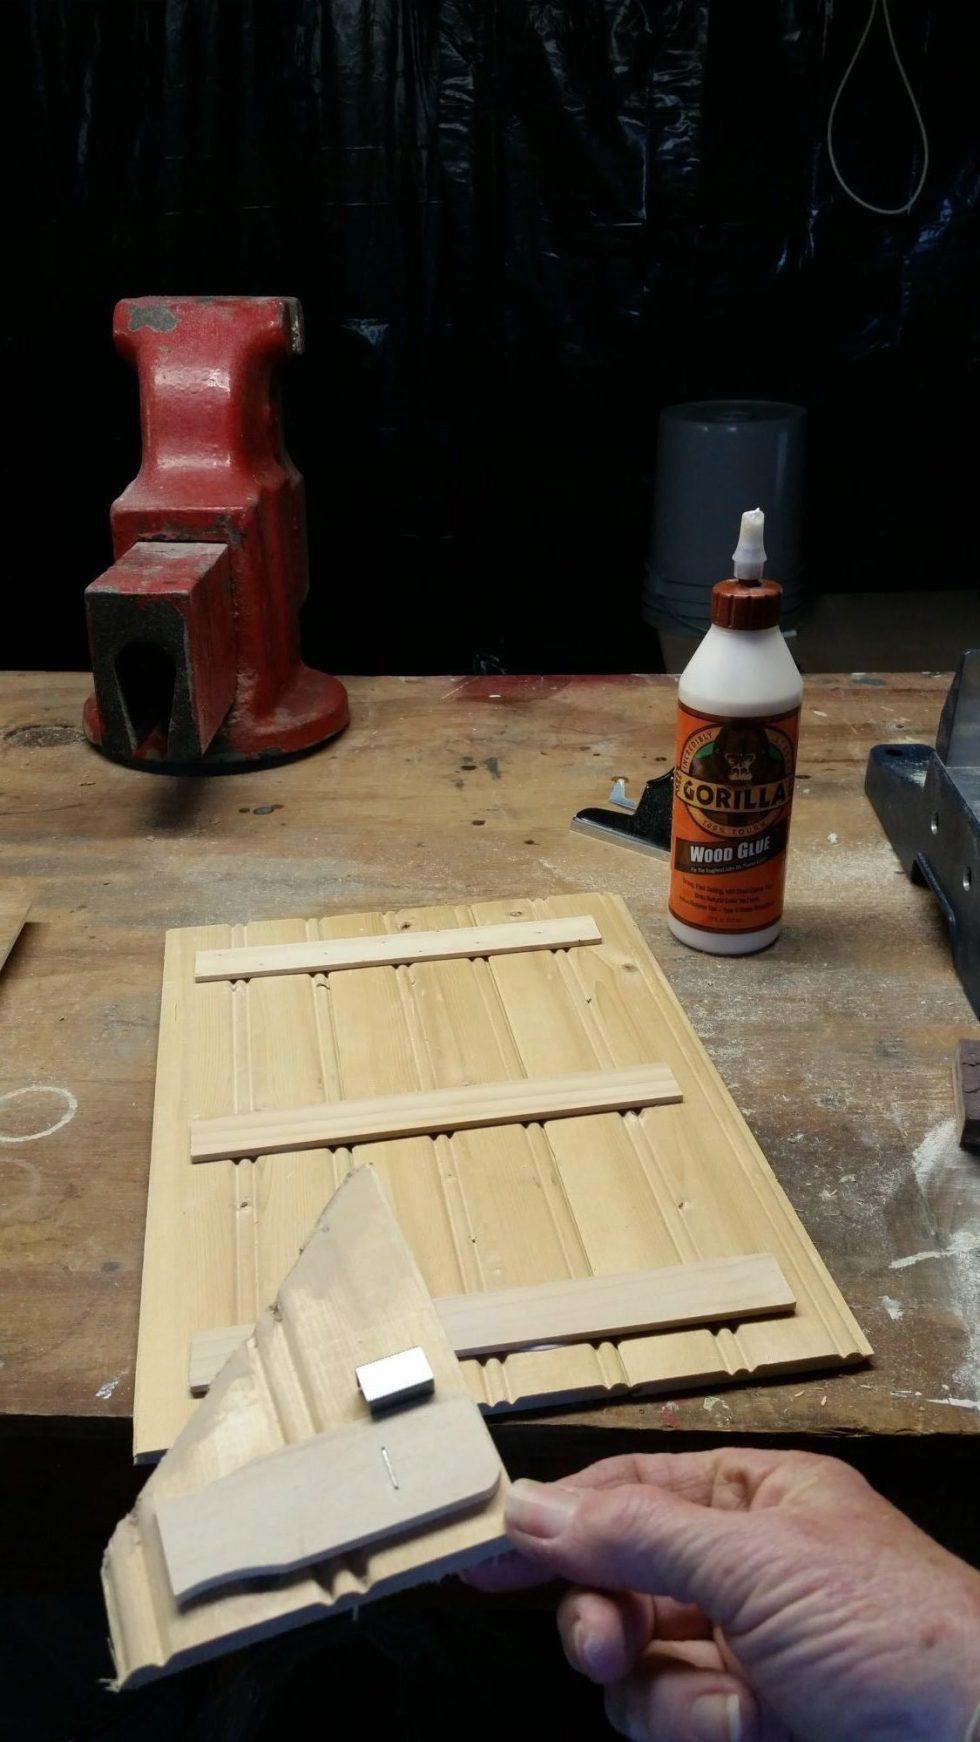 test staple in scrap material